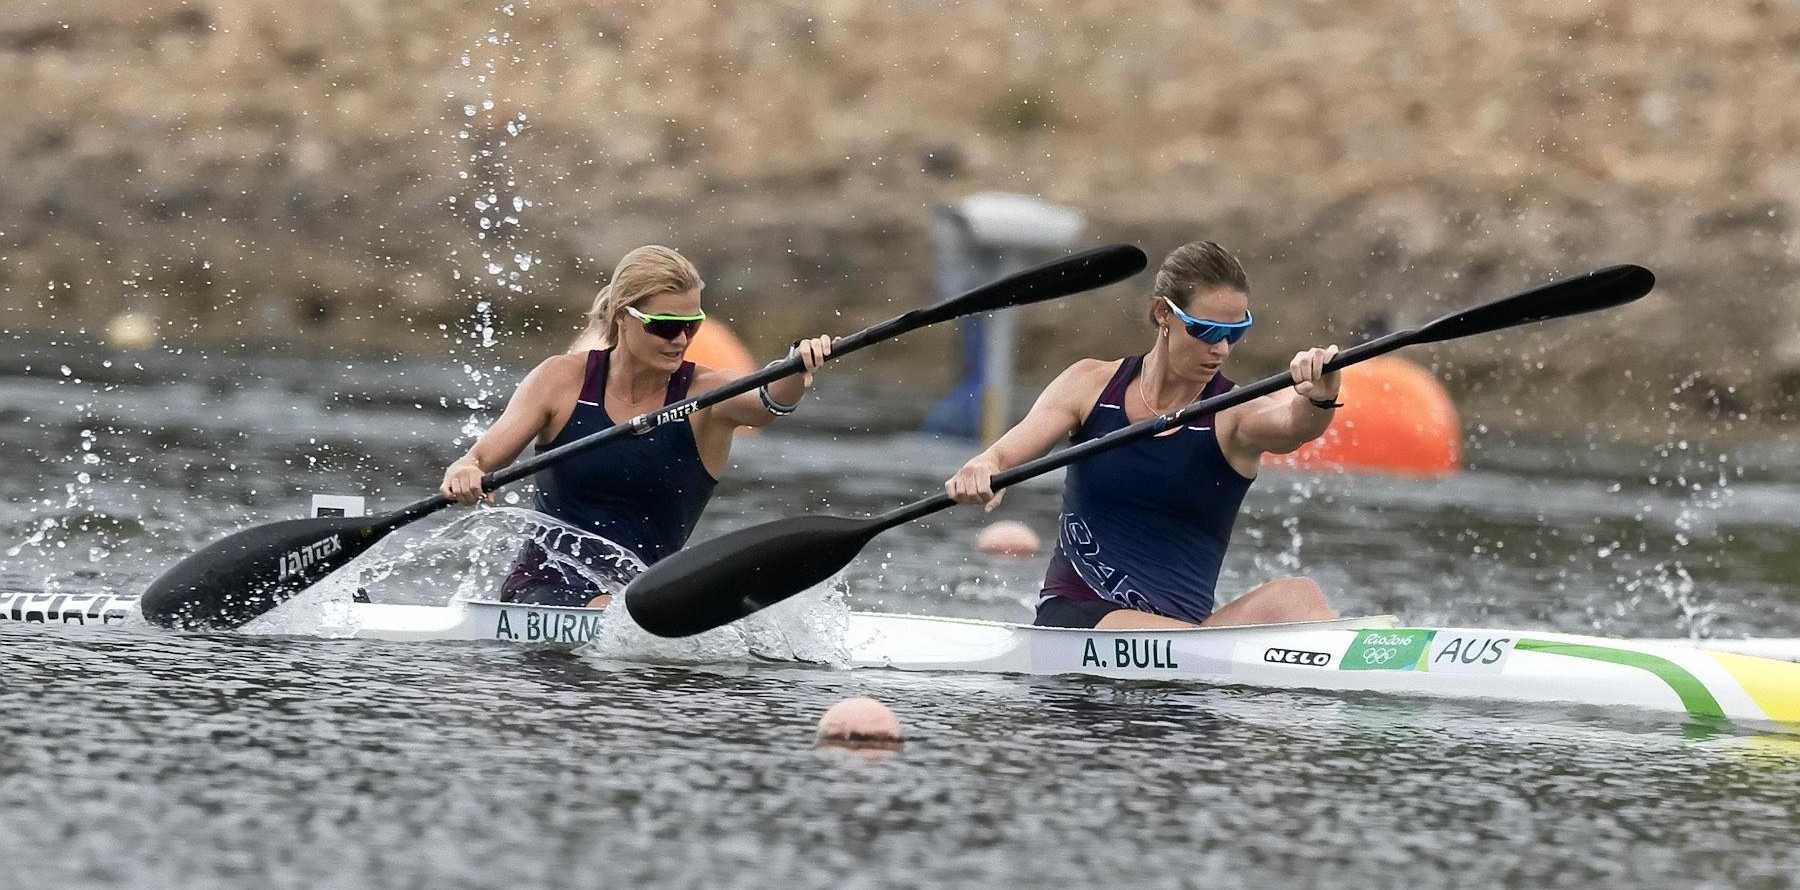 POWERFUL: Alyssa Bull and Alyce Burnett paddle hard in Sydney.